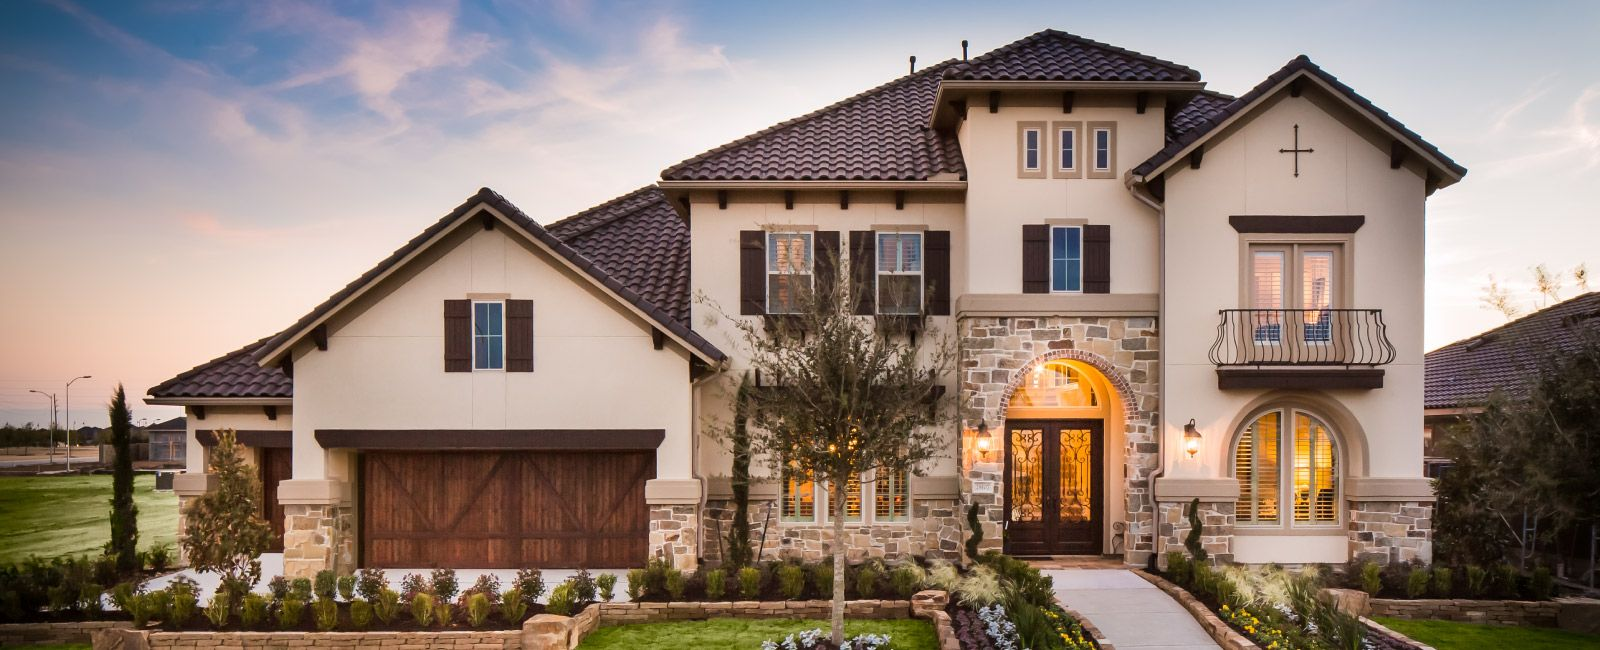 Single Family for Sale at Plan F992 27930 Starlight Harbor Ln Fulshear, Texas 77441 United States